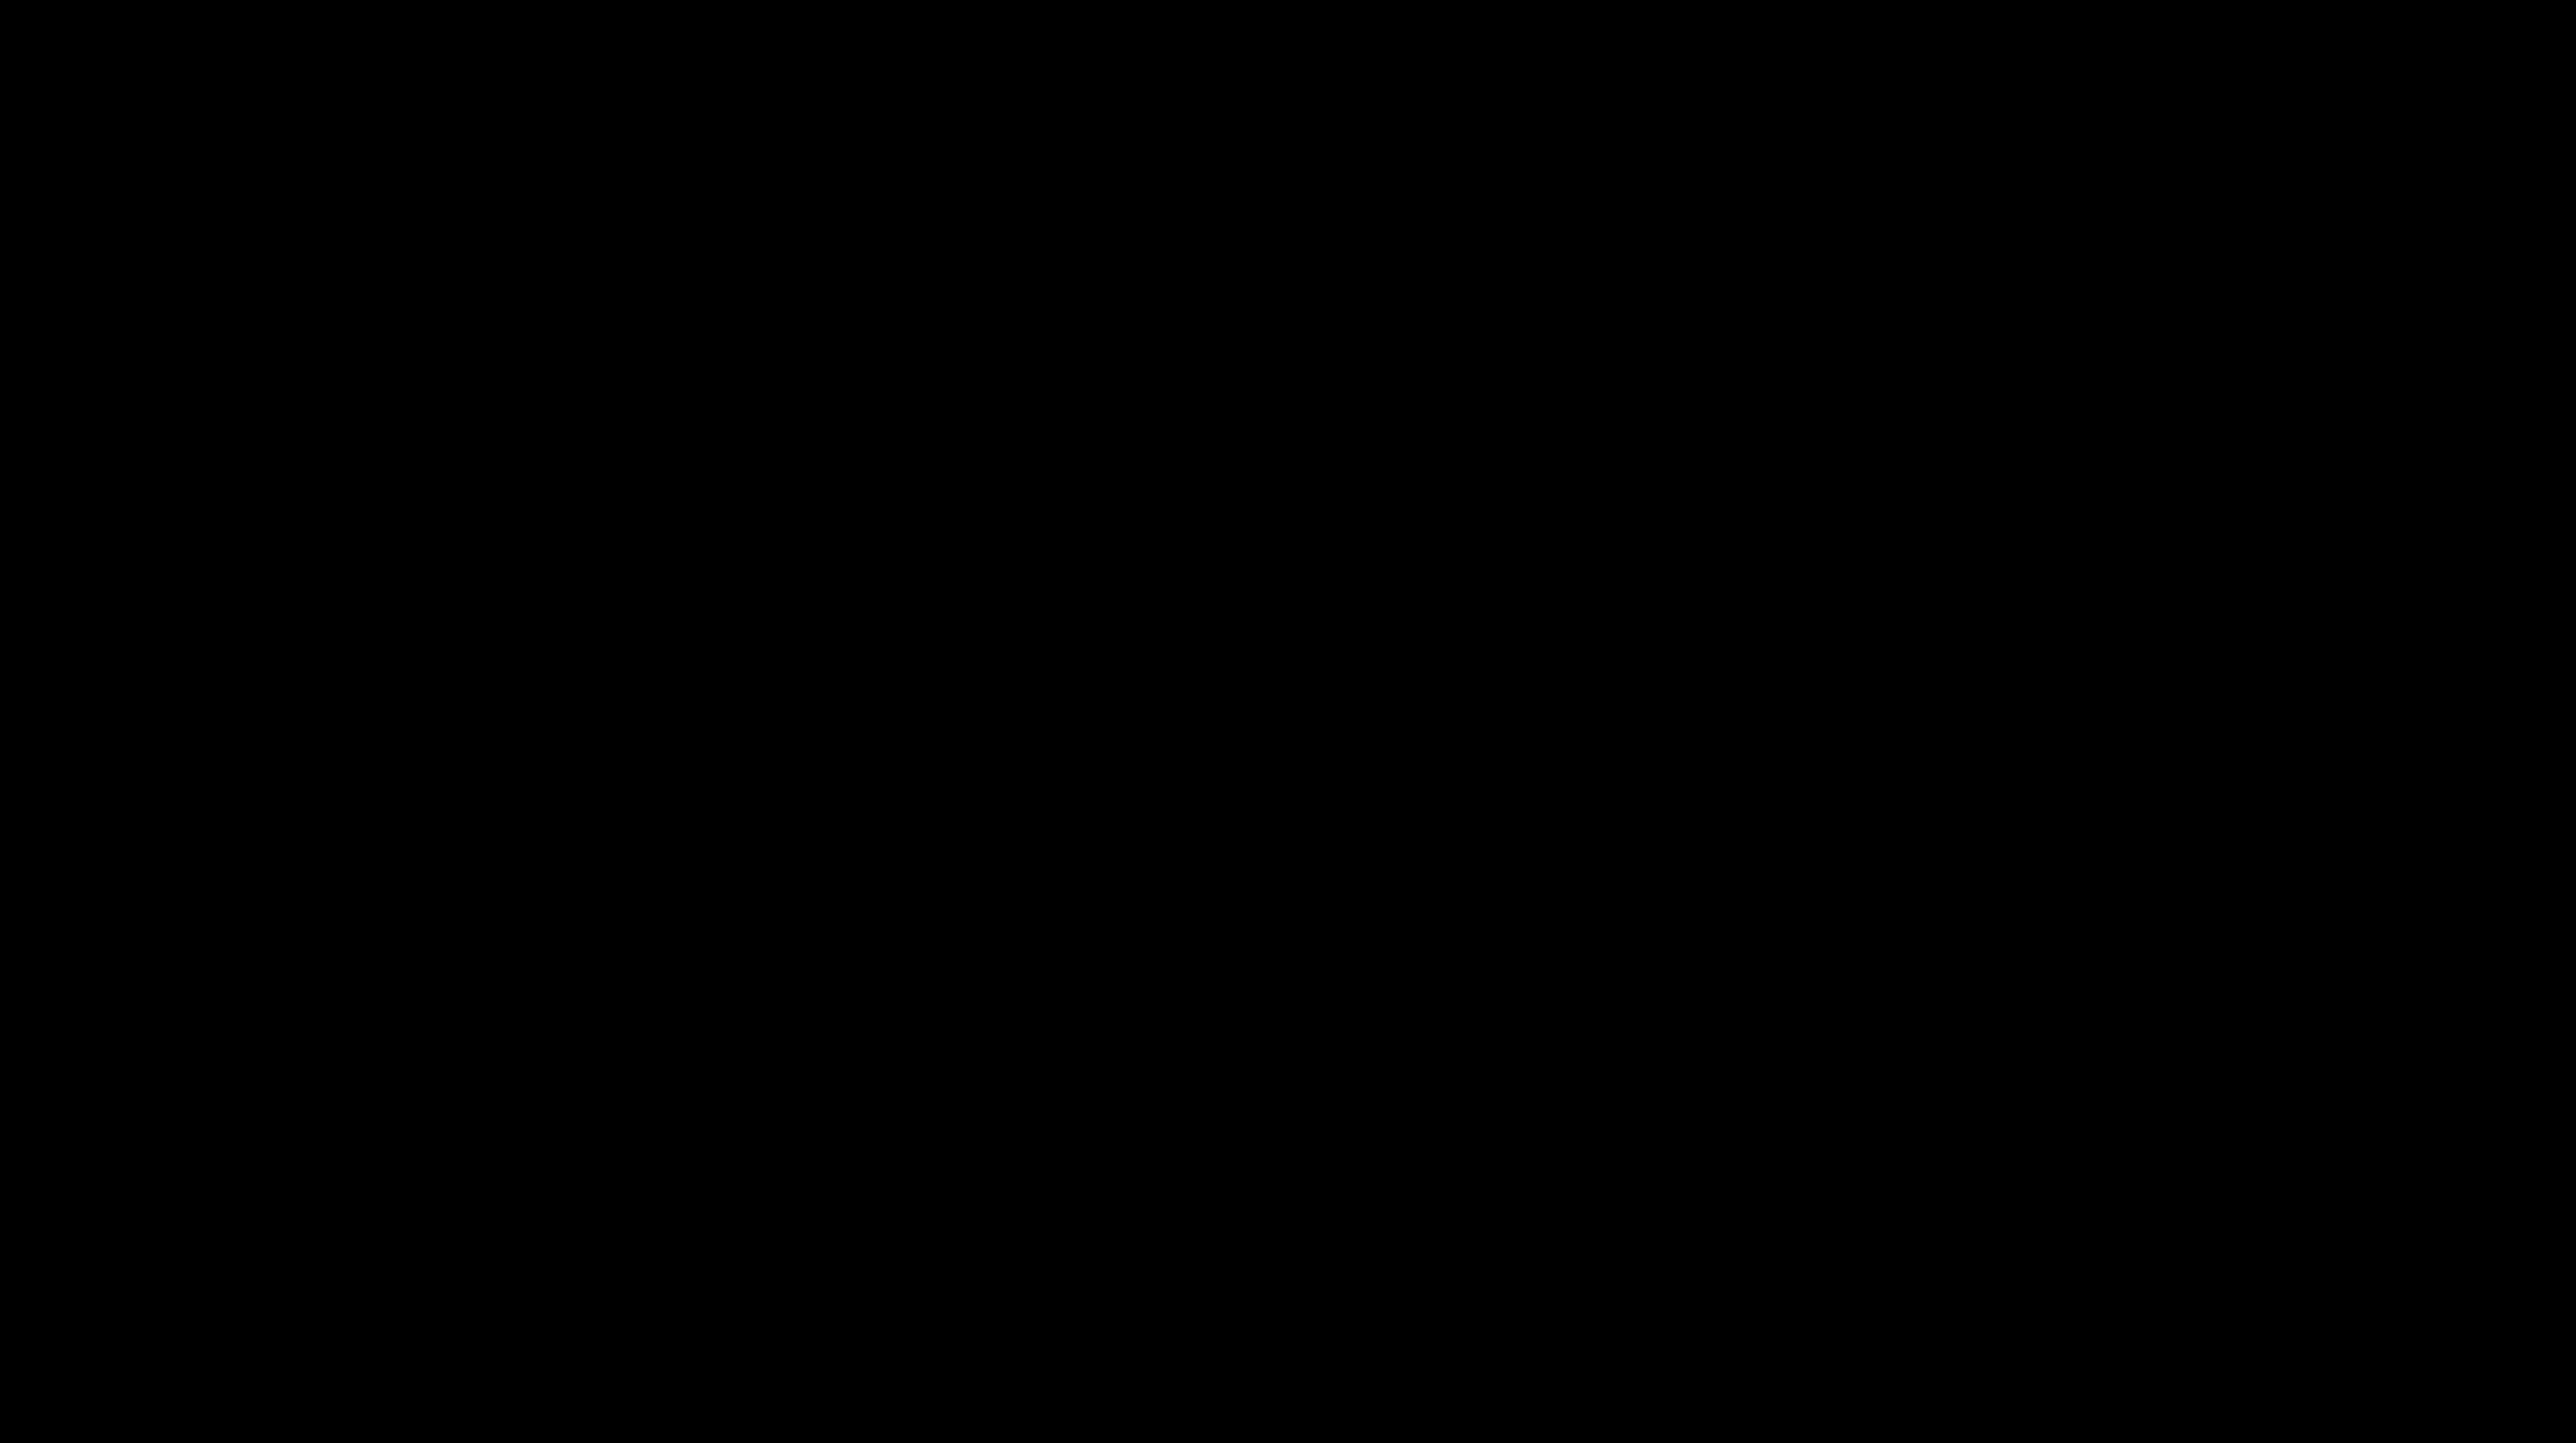 jol_3517-2